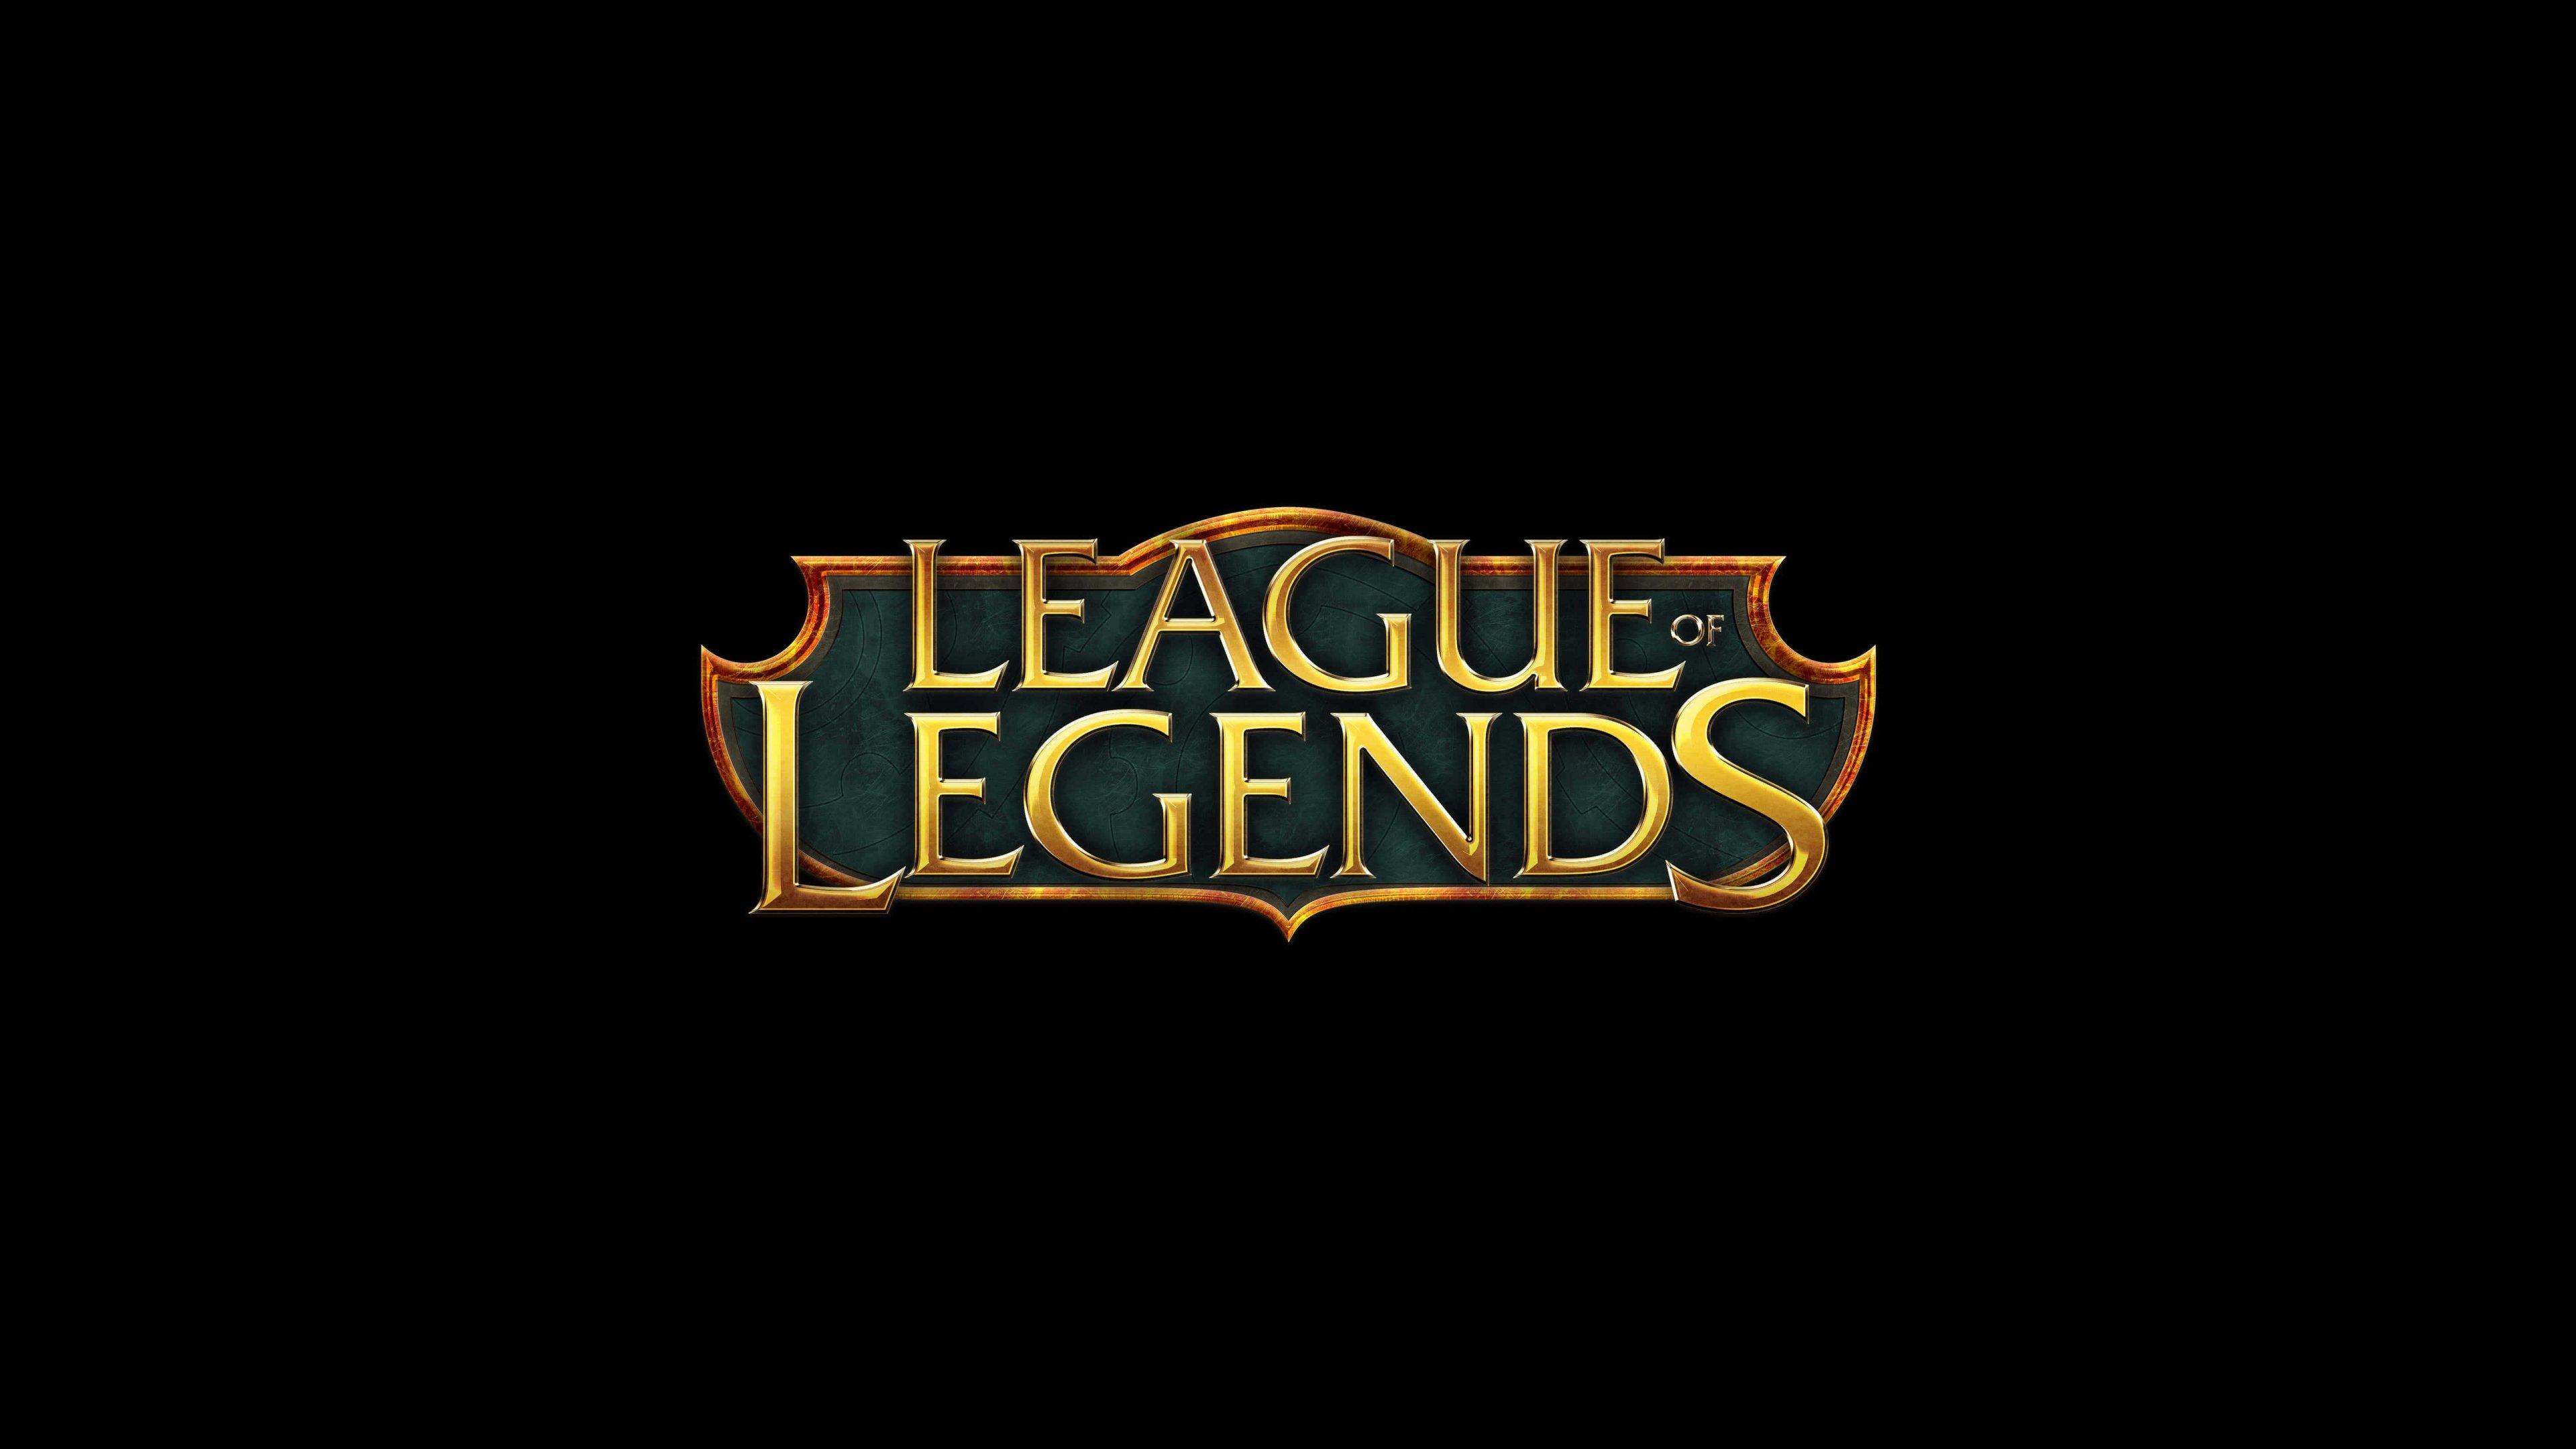 League Of Legends Logo Fondo de pantalla 5k Ultra HD ID:3815